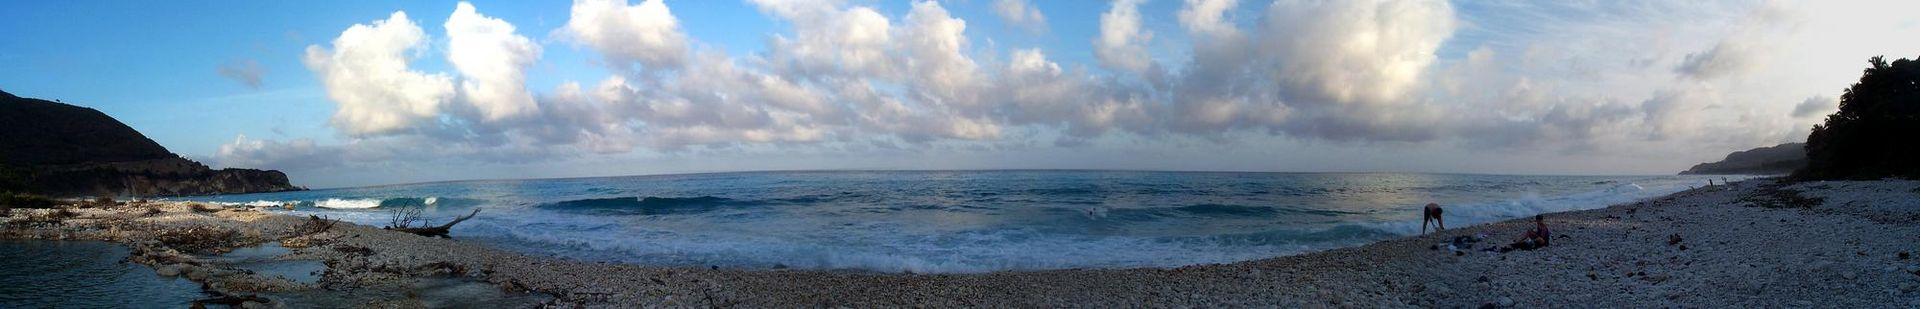 2014 Sept - DR - beach